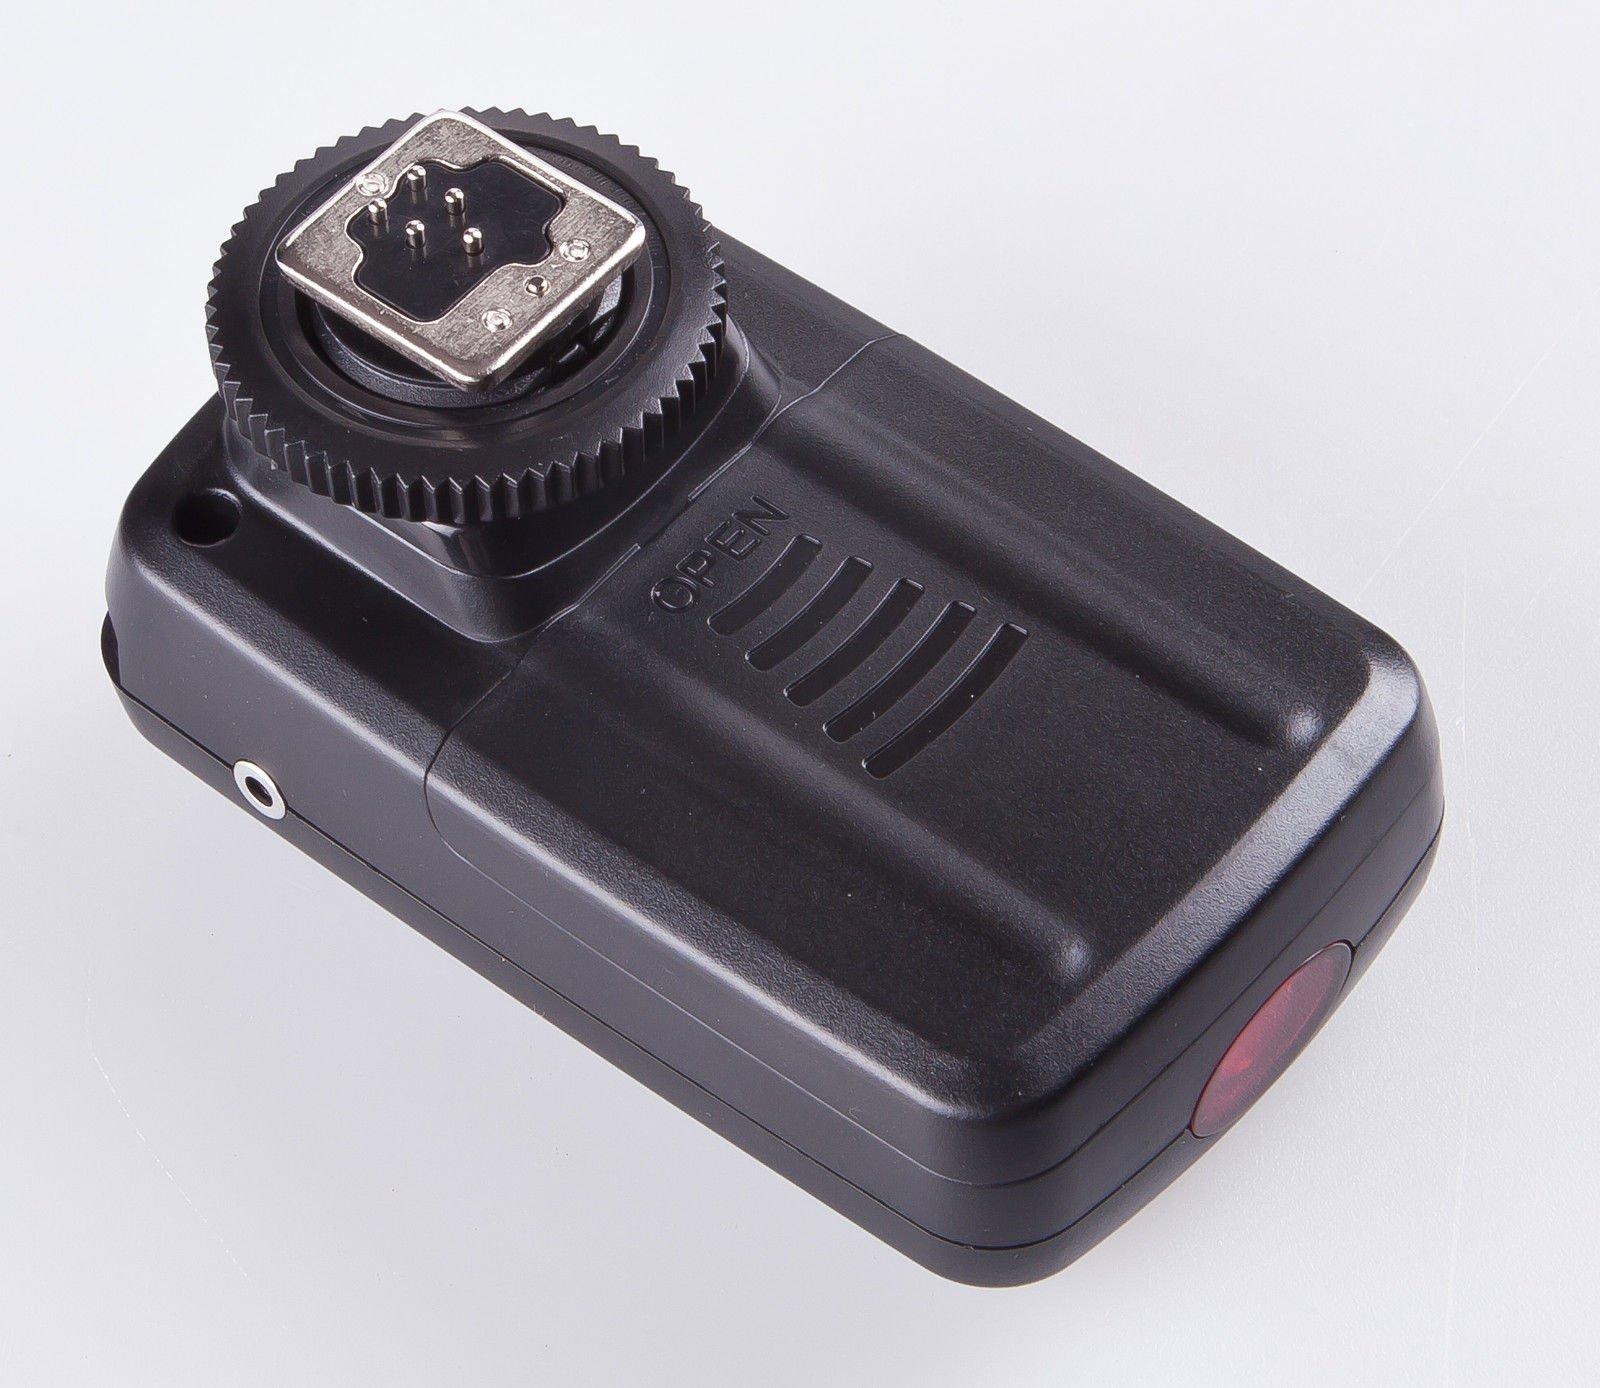 NiceFoto TTL-316C 1/8000s High-Speed Wireless Synchronization Flash Trigger and Receiver